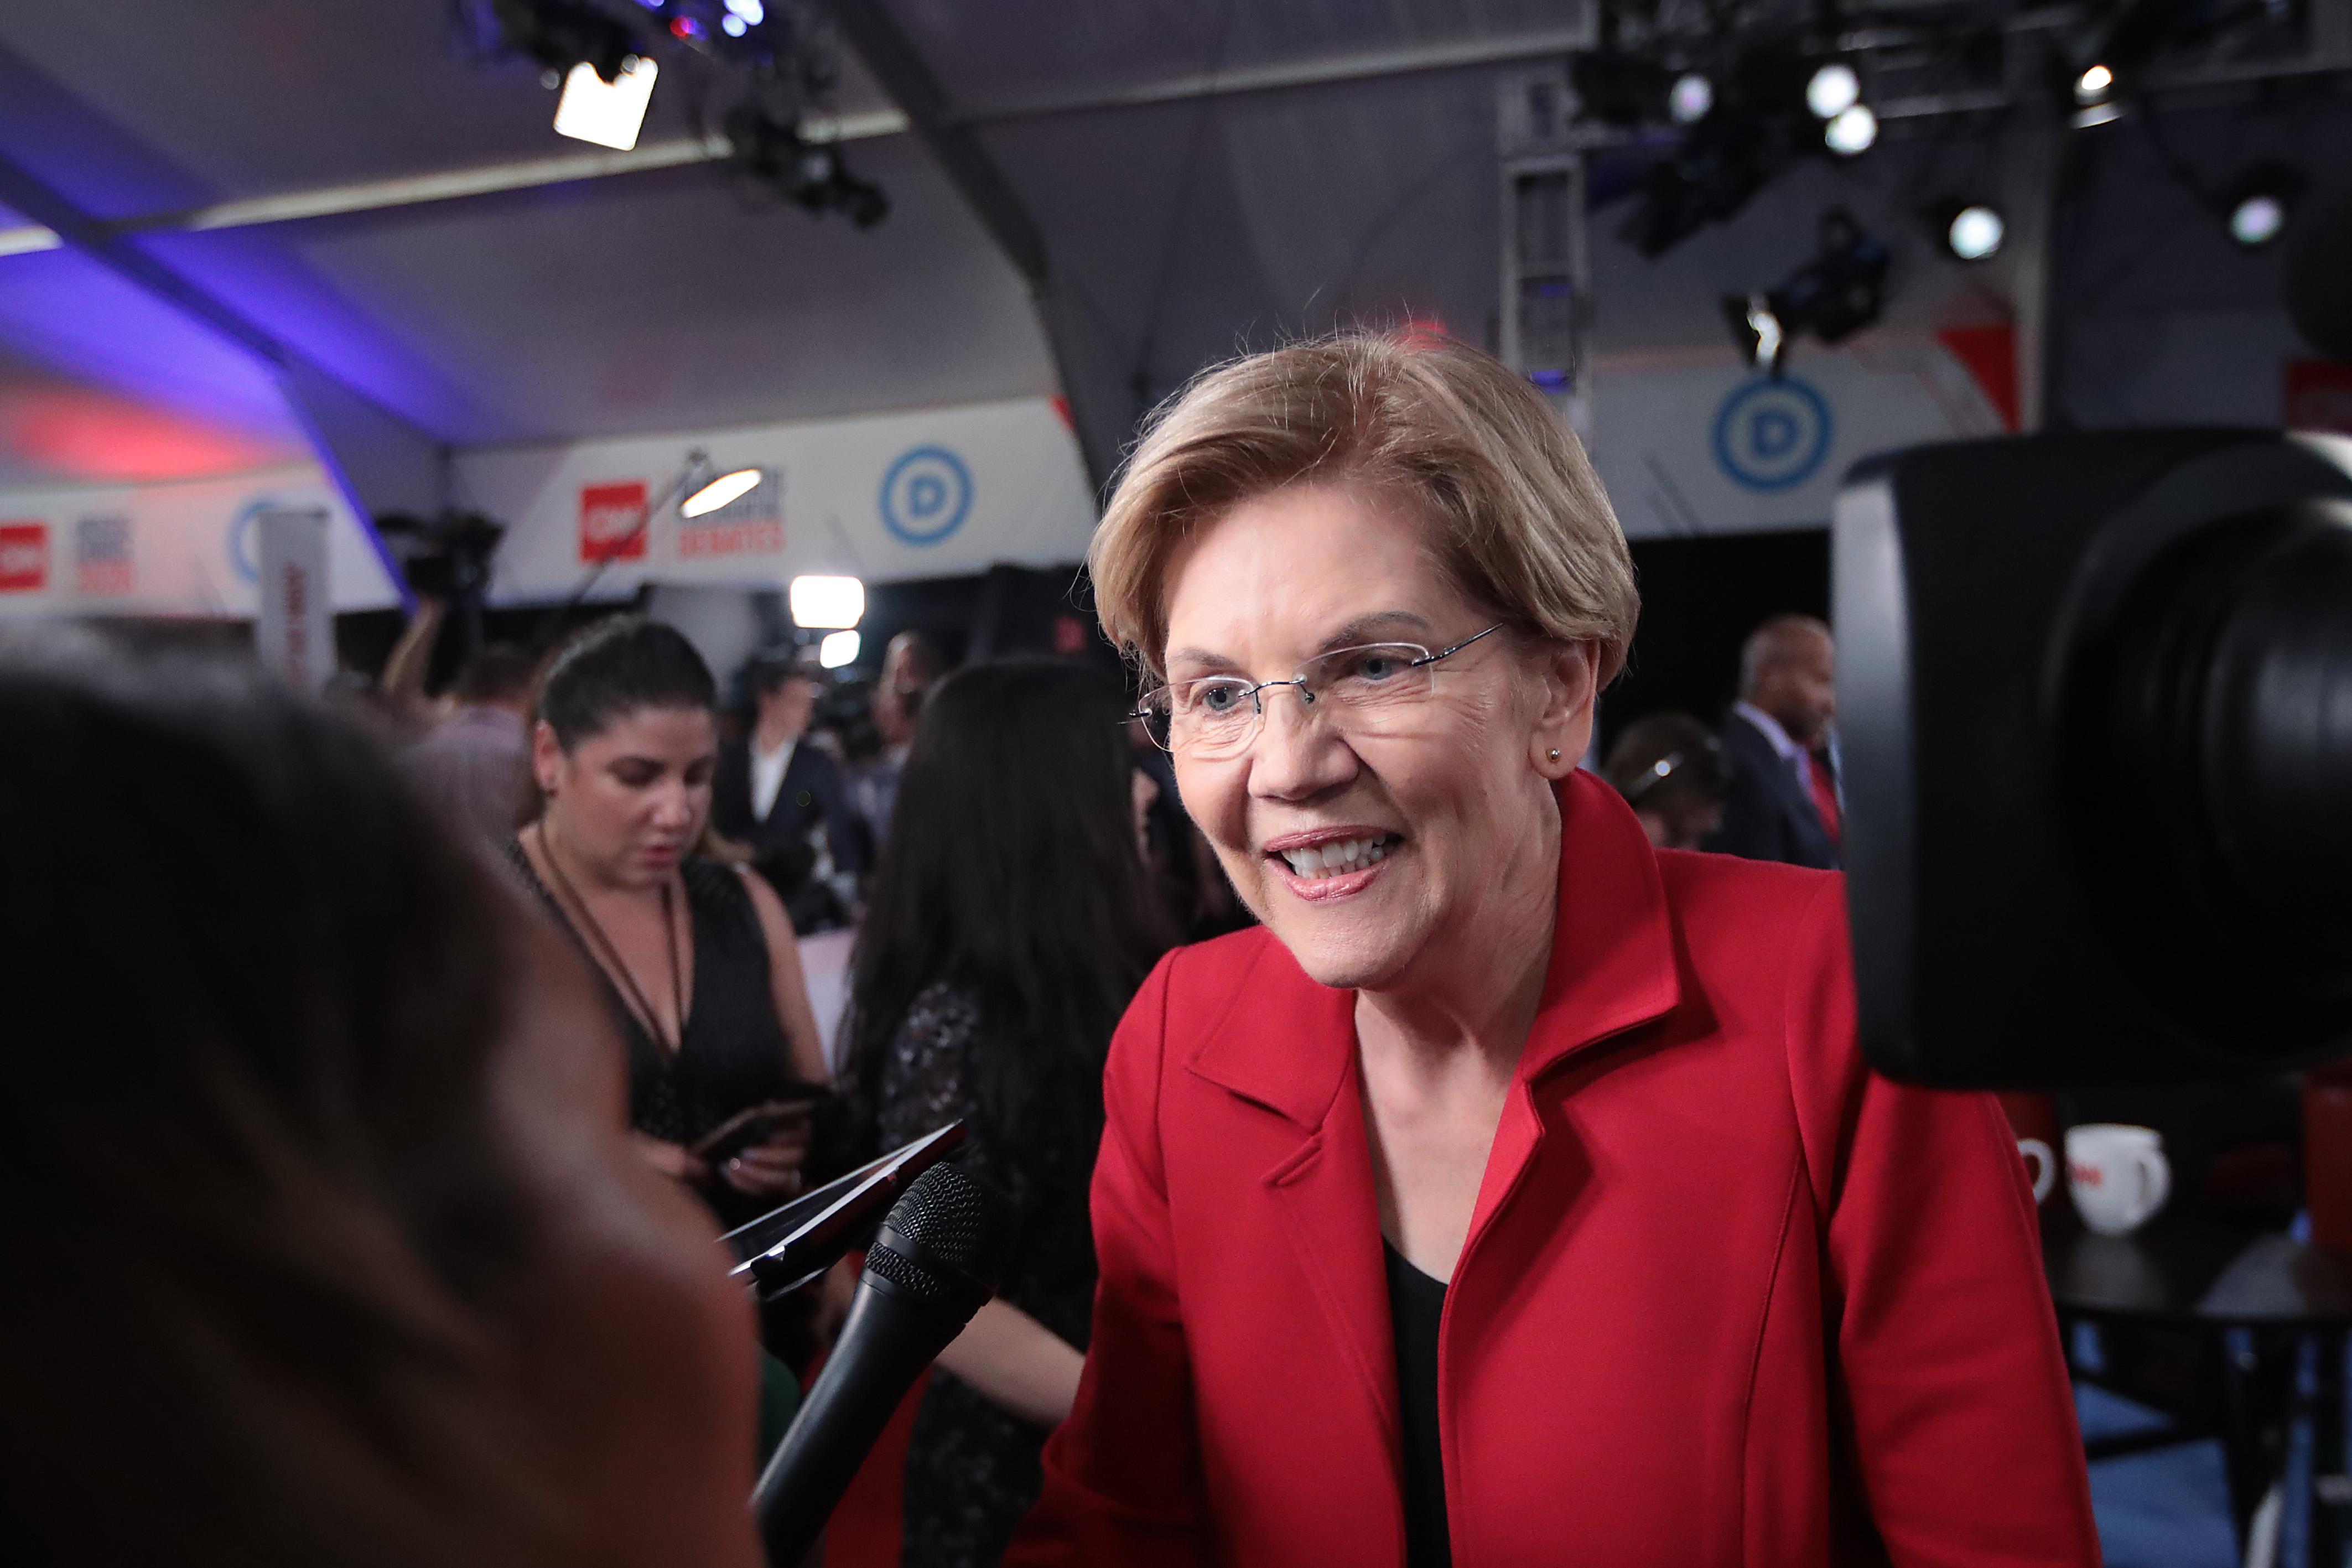 Elizabeth Warren has a new plan to reduce gun violence by 80 percent